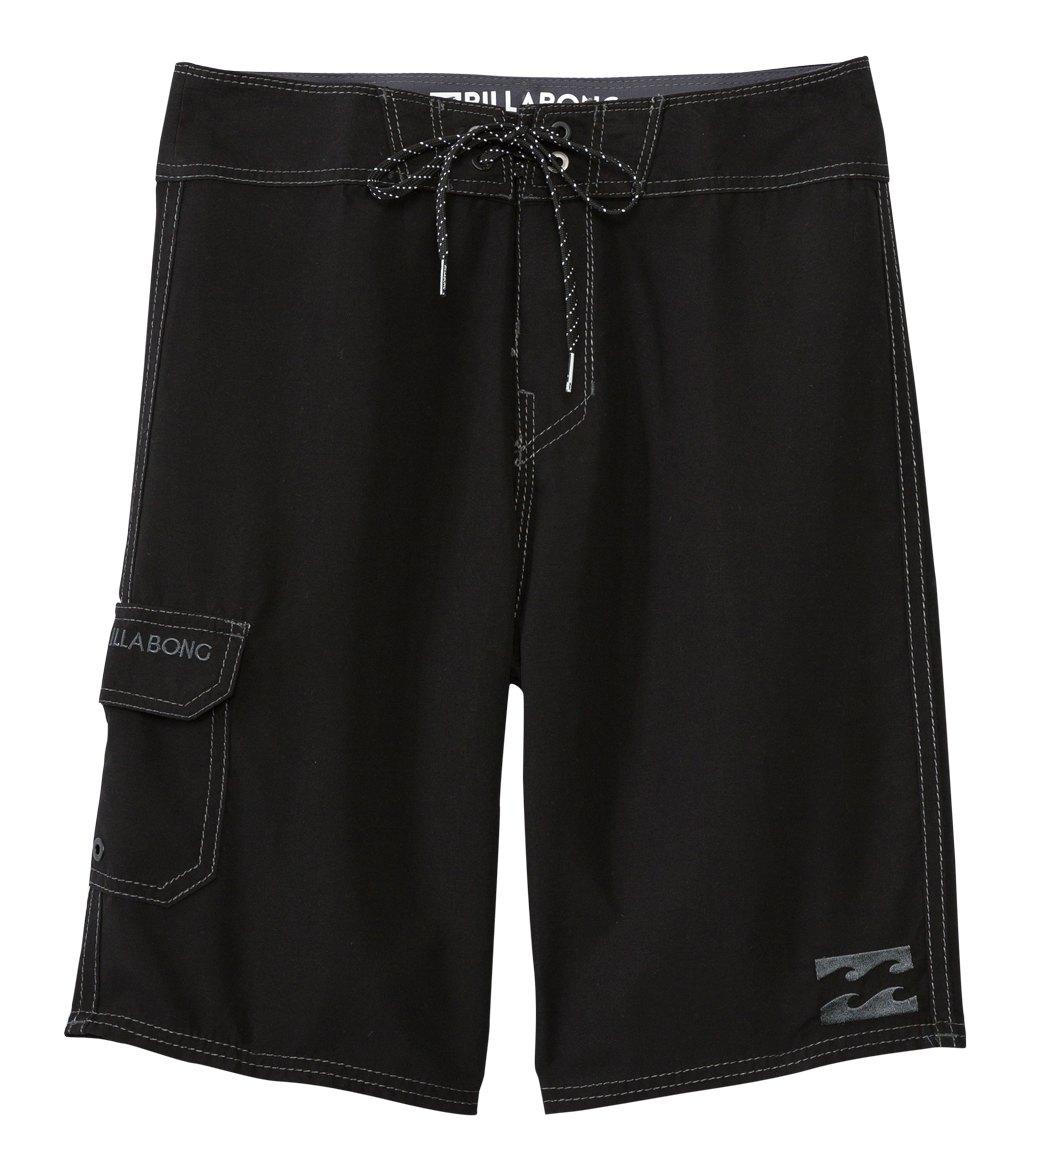 09c9046cb0 Billabong Men's All Day Boardshorts at SwimOutlet.com